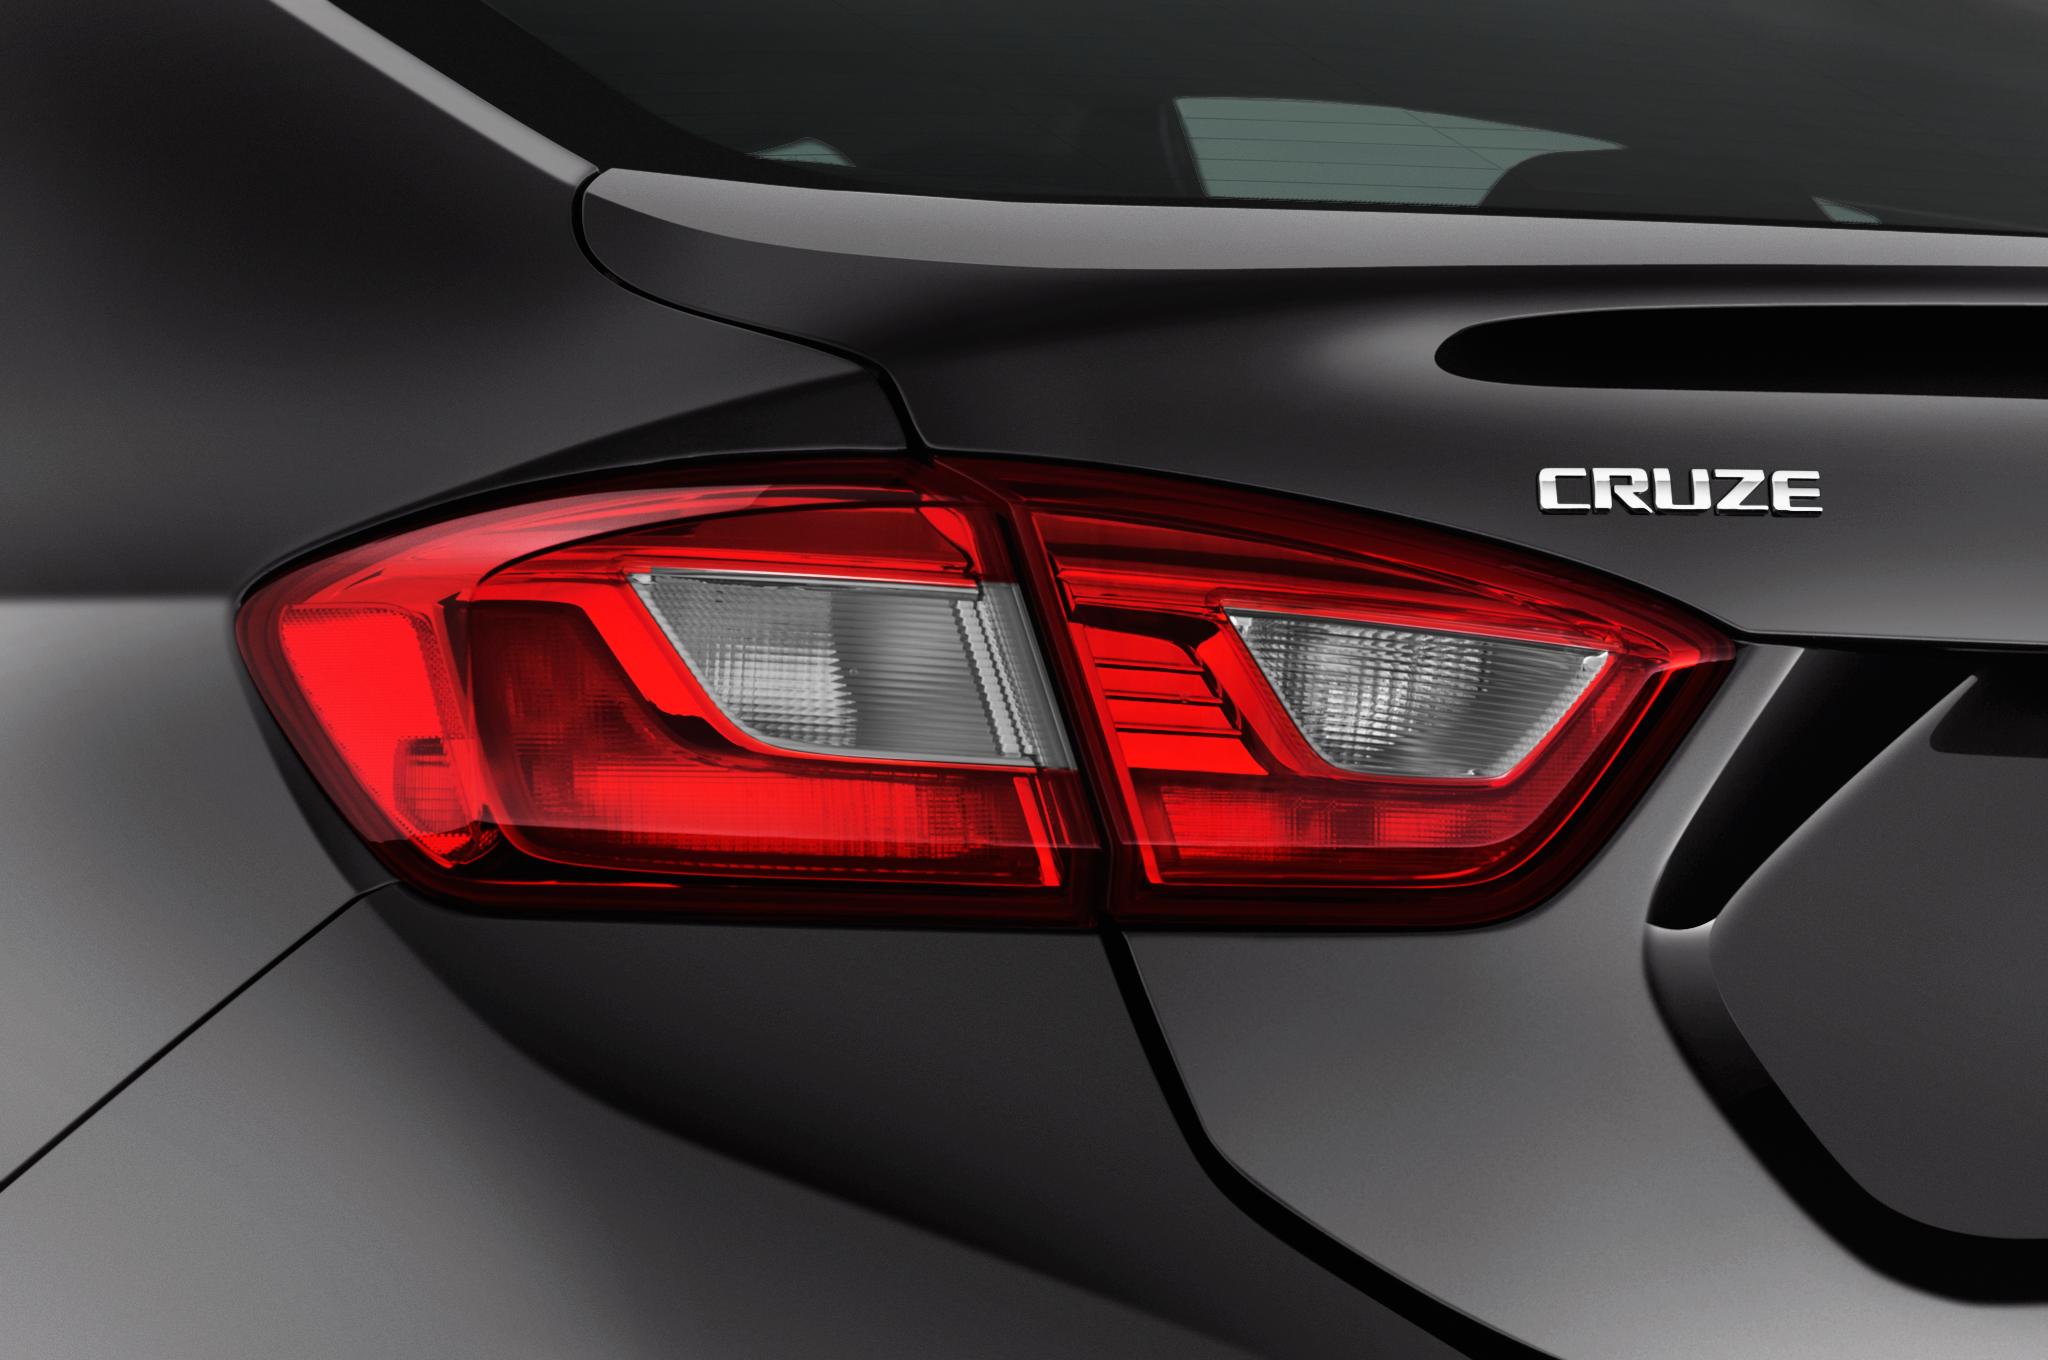 2016 chevrolet cruze second drive review automobile magazine 2013 Chevy Cruze Trunk Lock 26 96